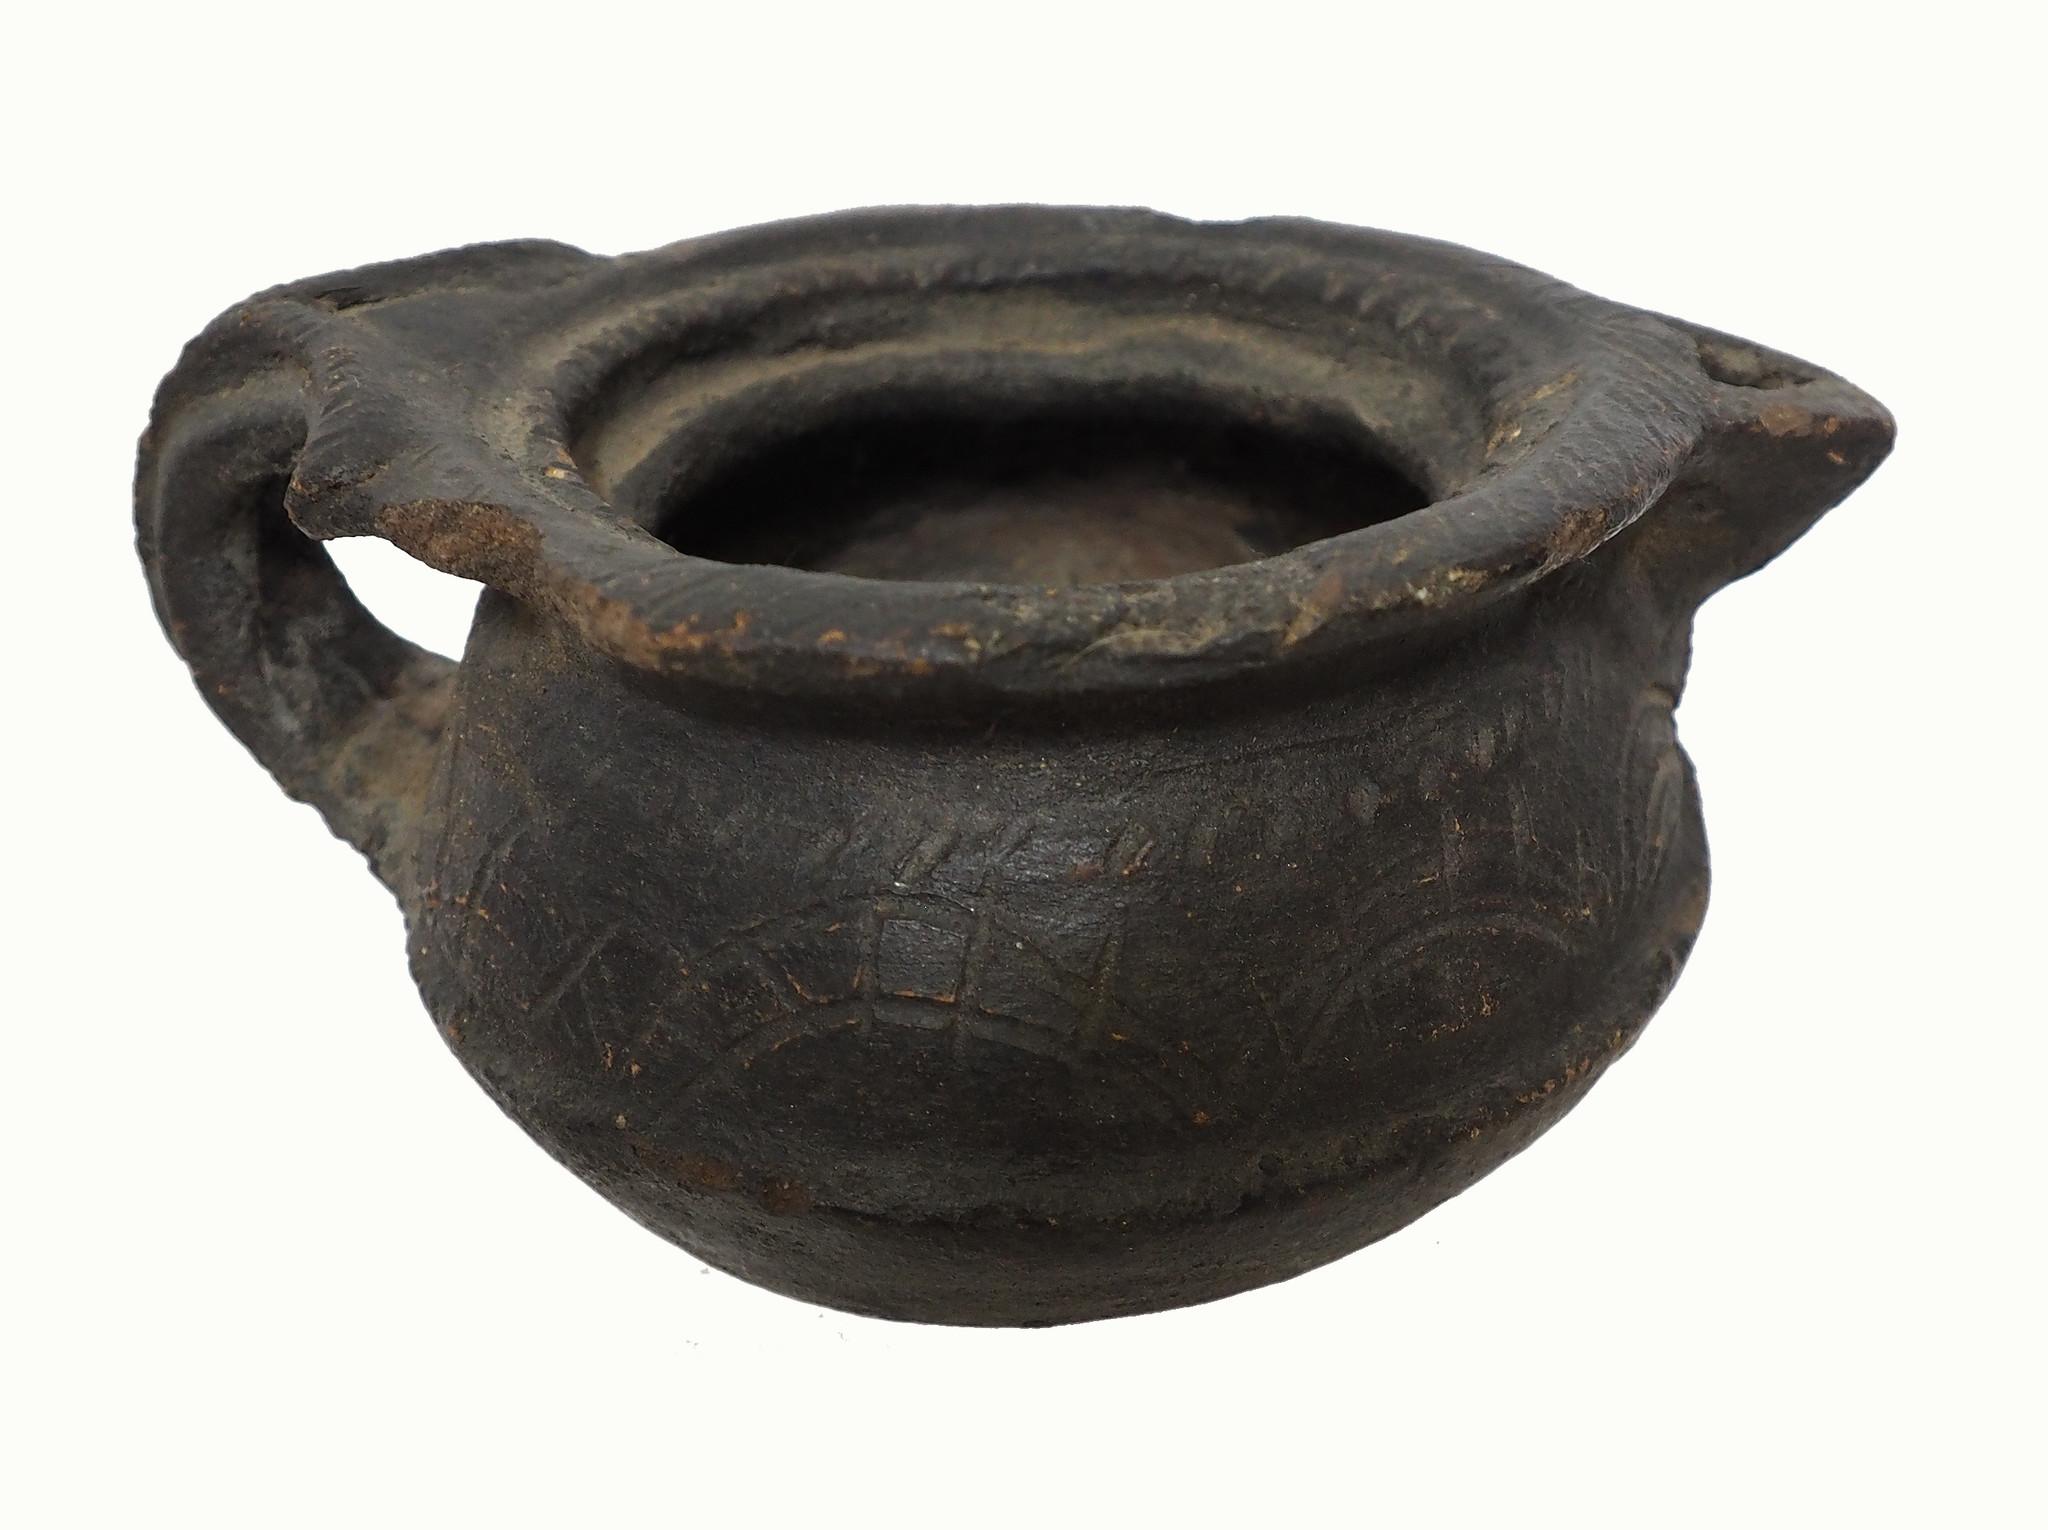 Antique Clay milk jug from Swat valley Pakistan  No:19/7